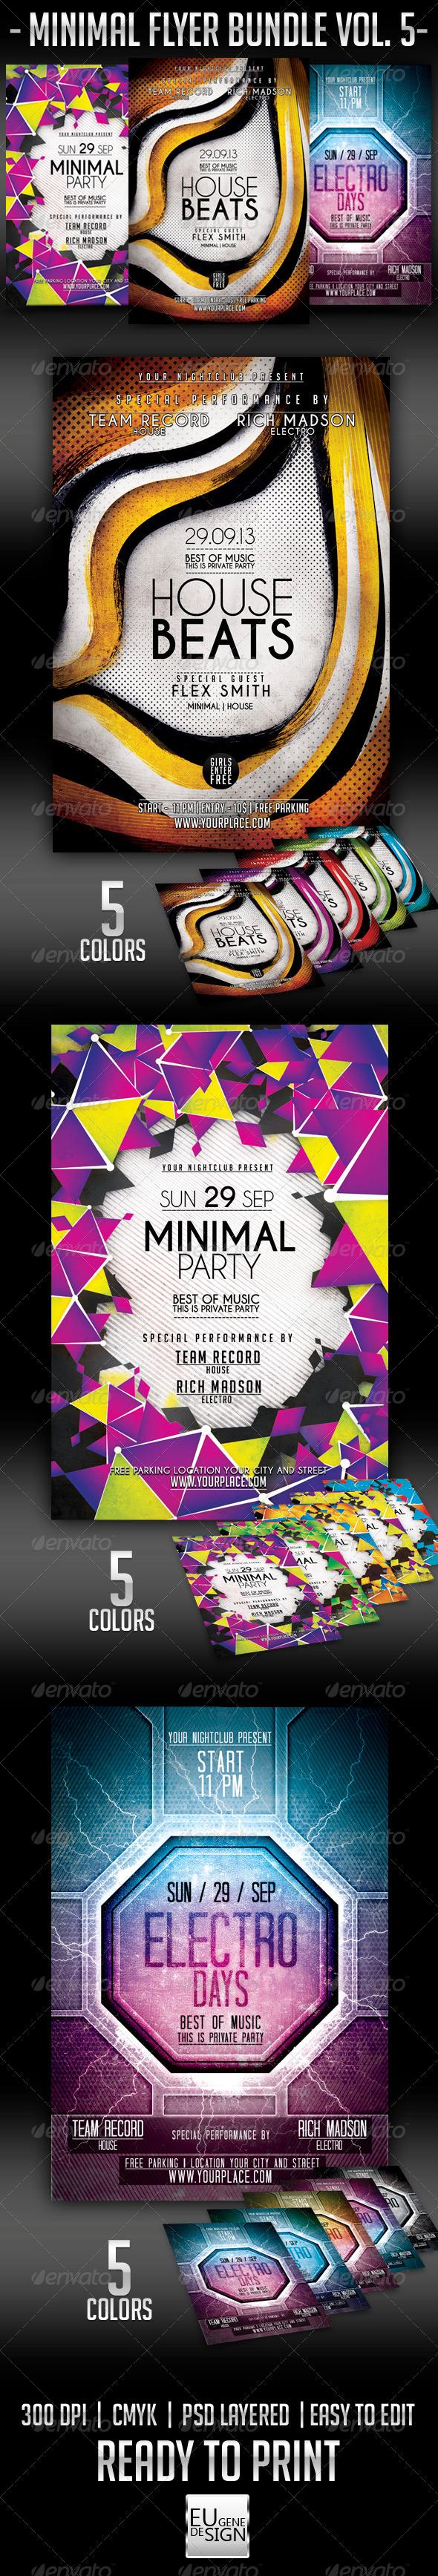 Minimal Flyer Bundle Vol.5 - Clubs & Parties Events